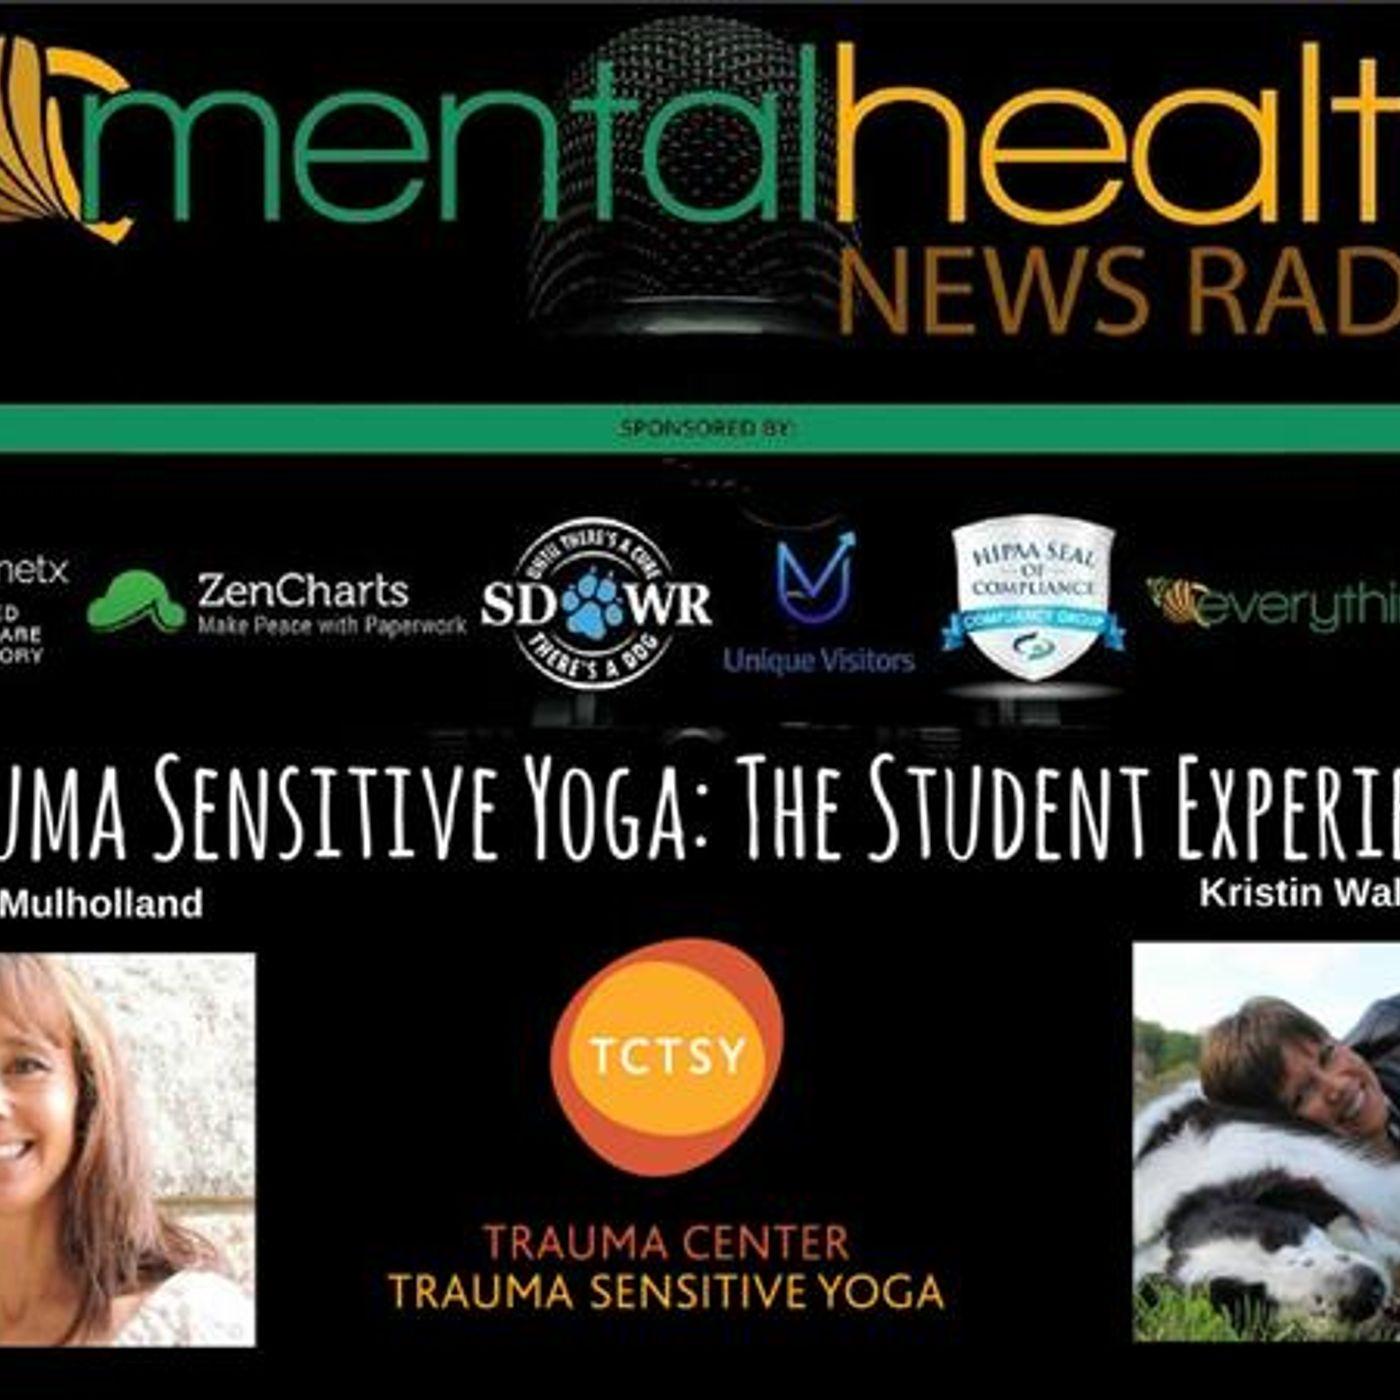 Mental Health News Radio - Trauma Sensitive Yoga: The Student Experience with Sonshine Yoga